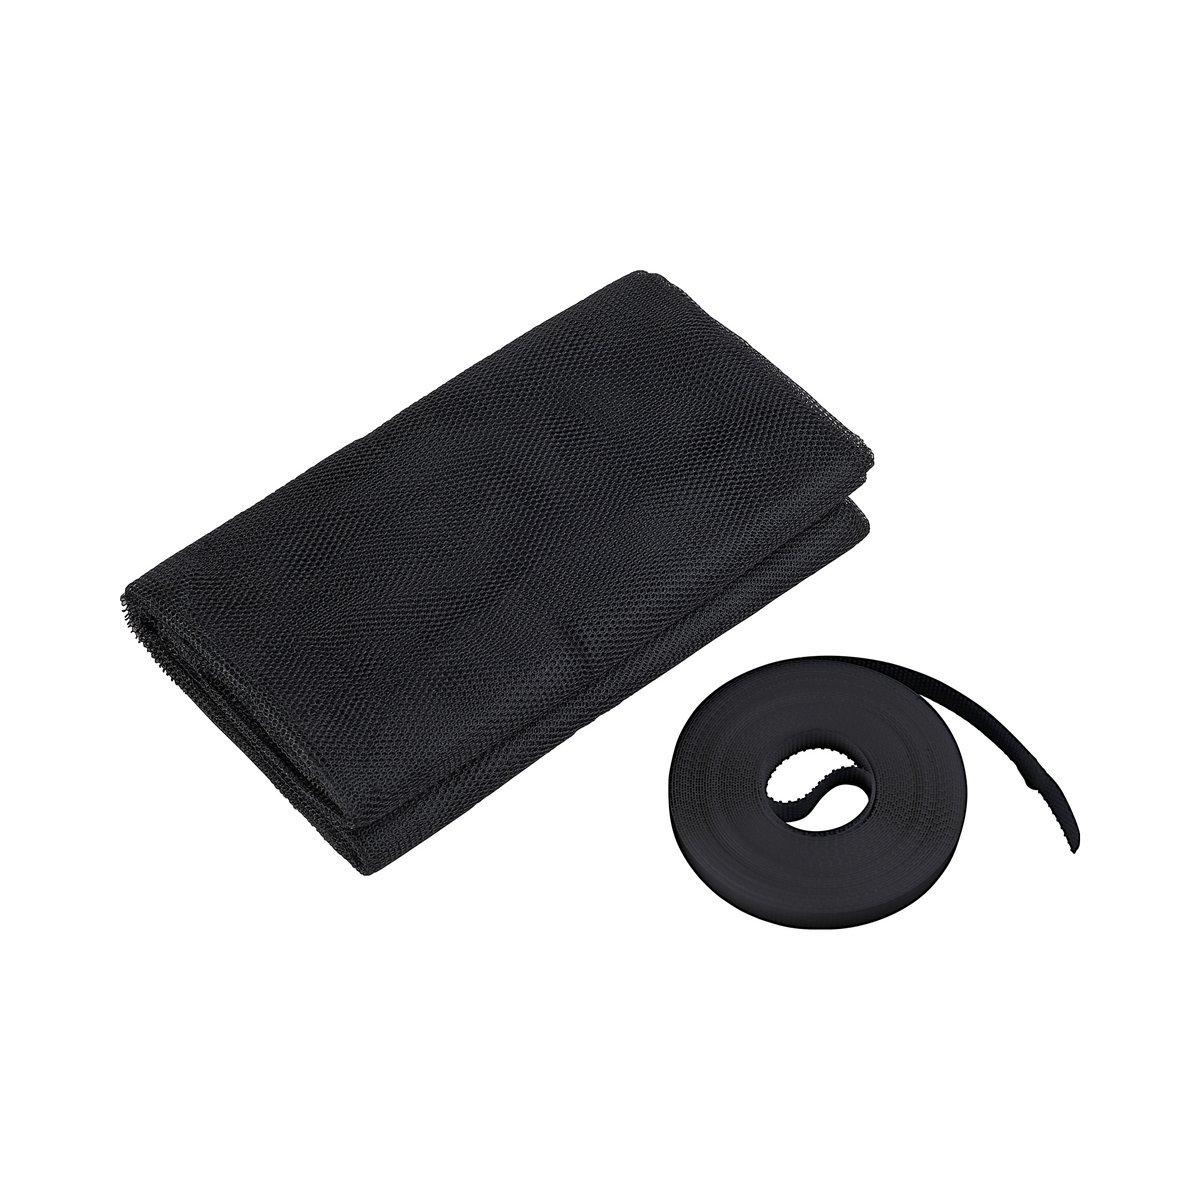 100190105-CU antracita//gris Culex poli/éster-mosquitera para ventana 130 x 150 cm